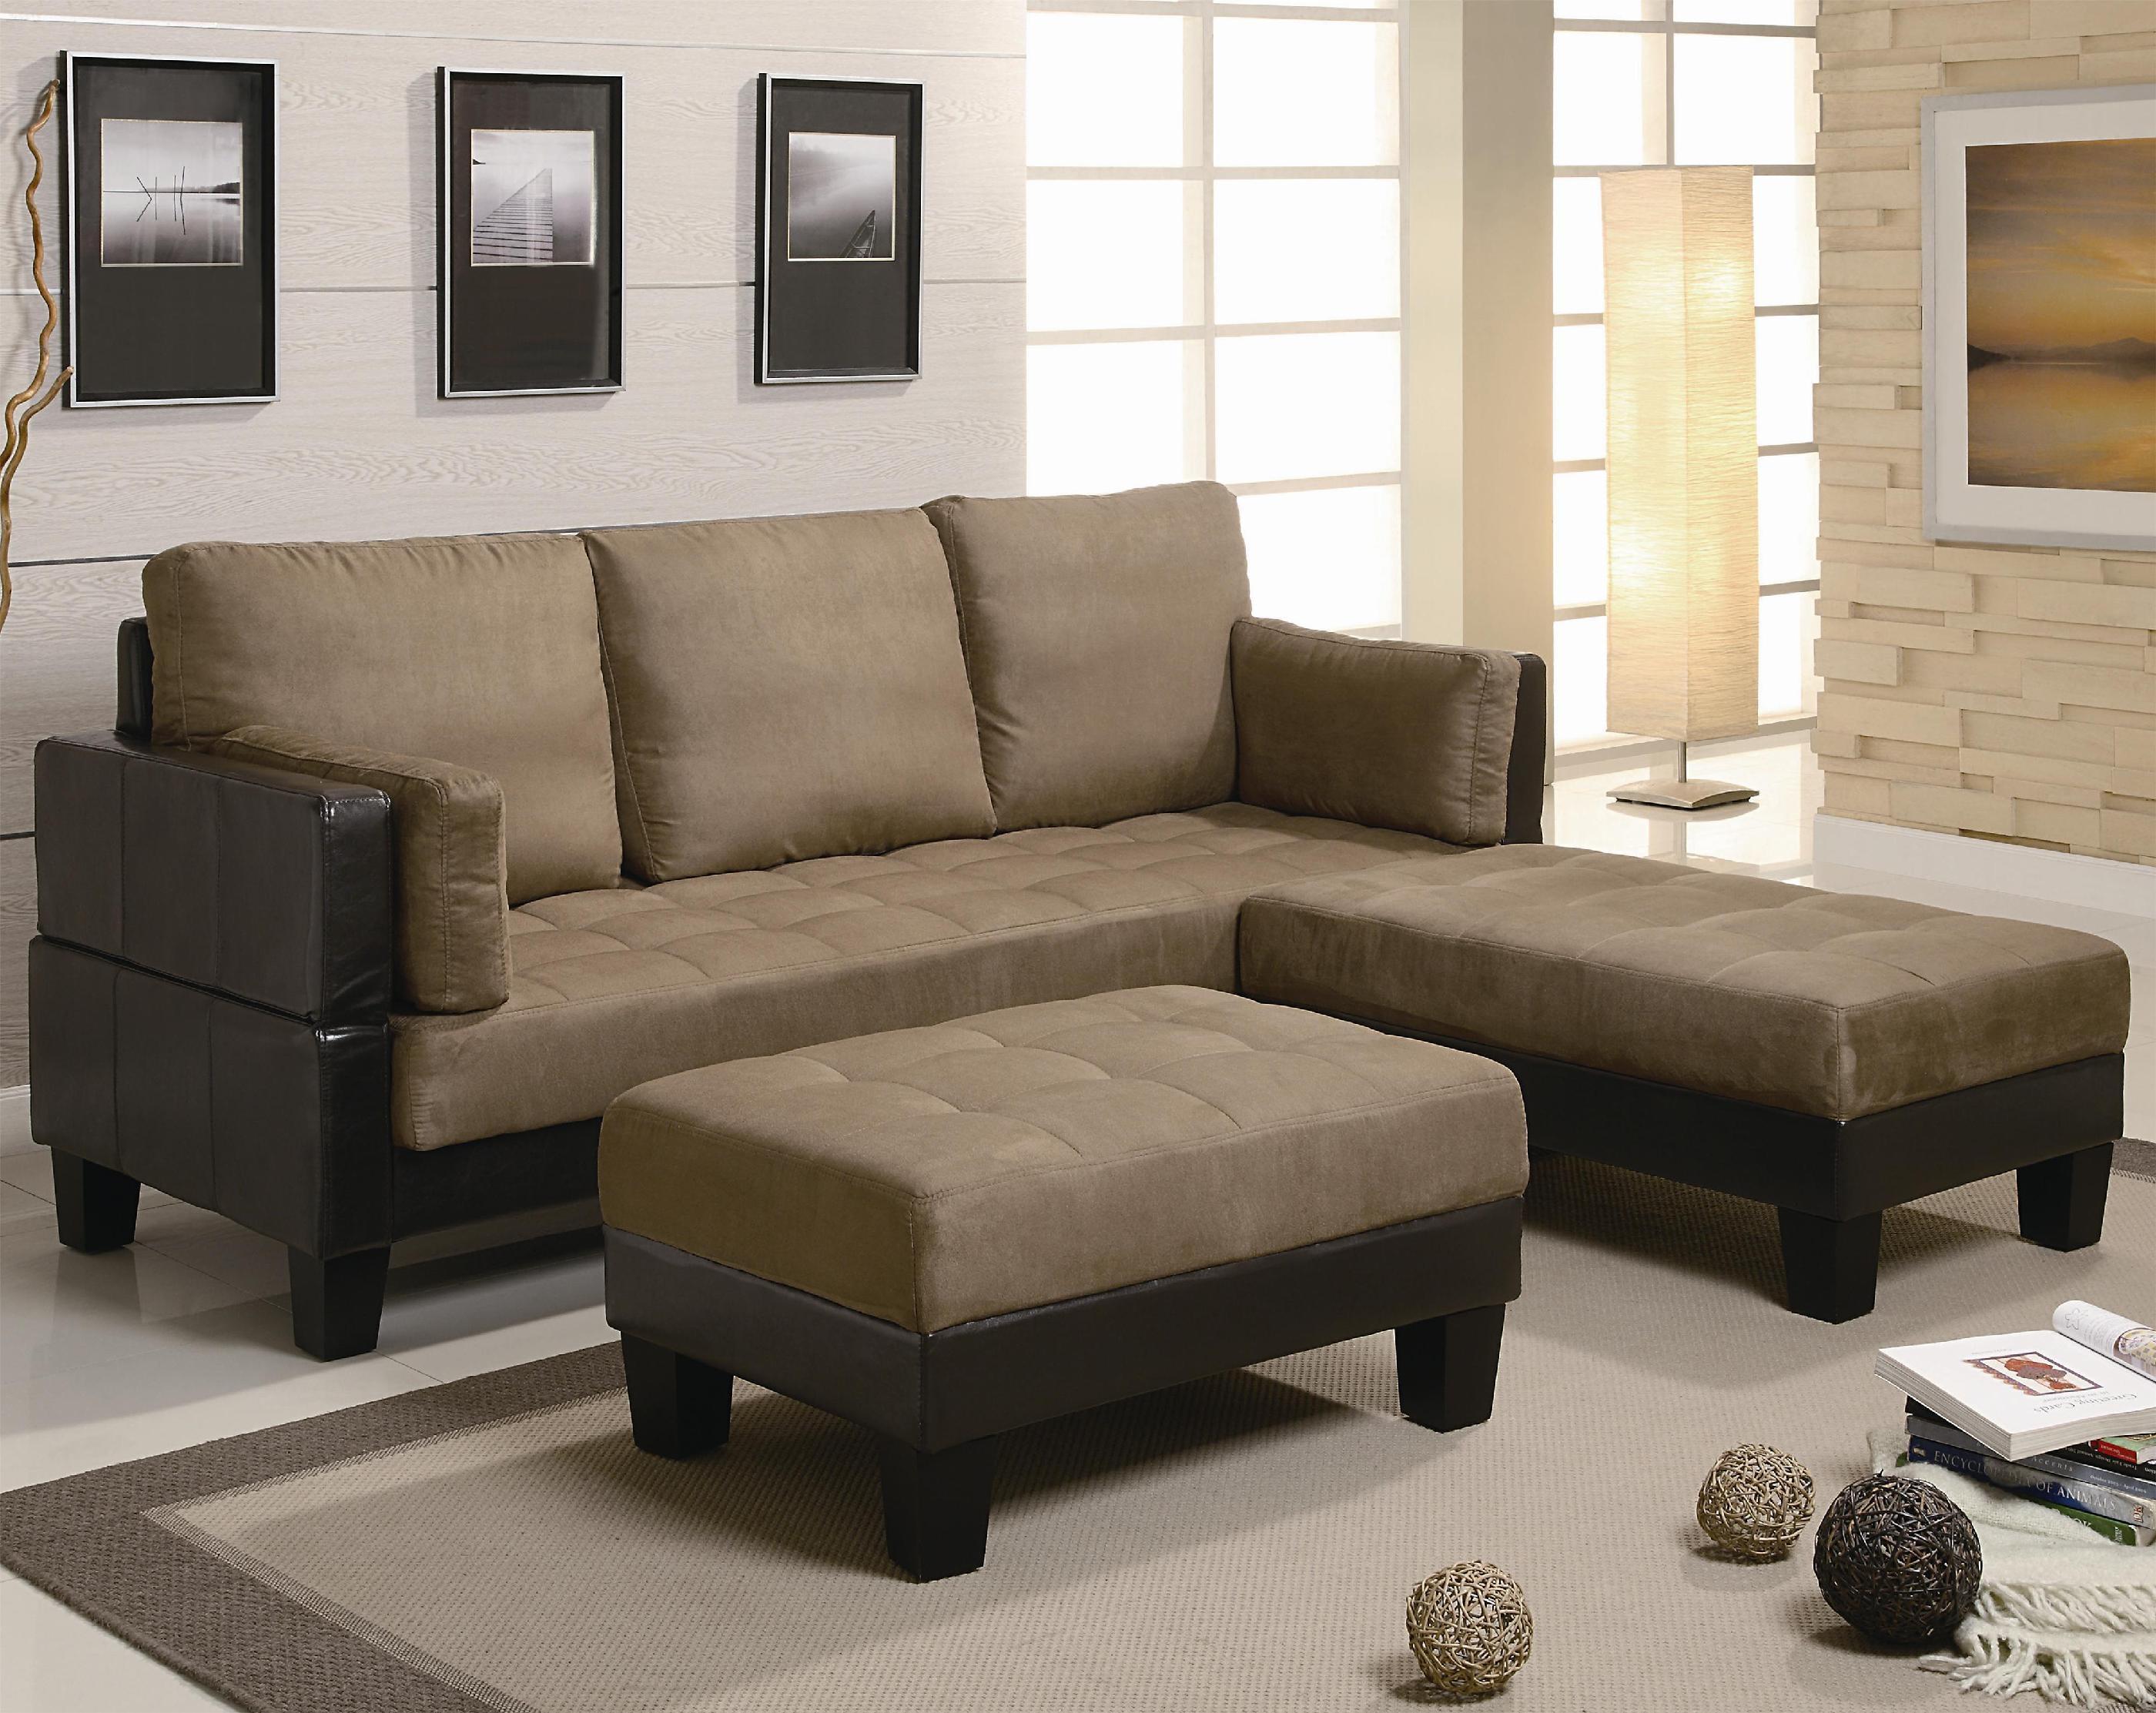 Coaster Living Room Sofa Bed 300160Carolina Furniture Concepts